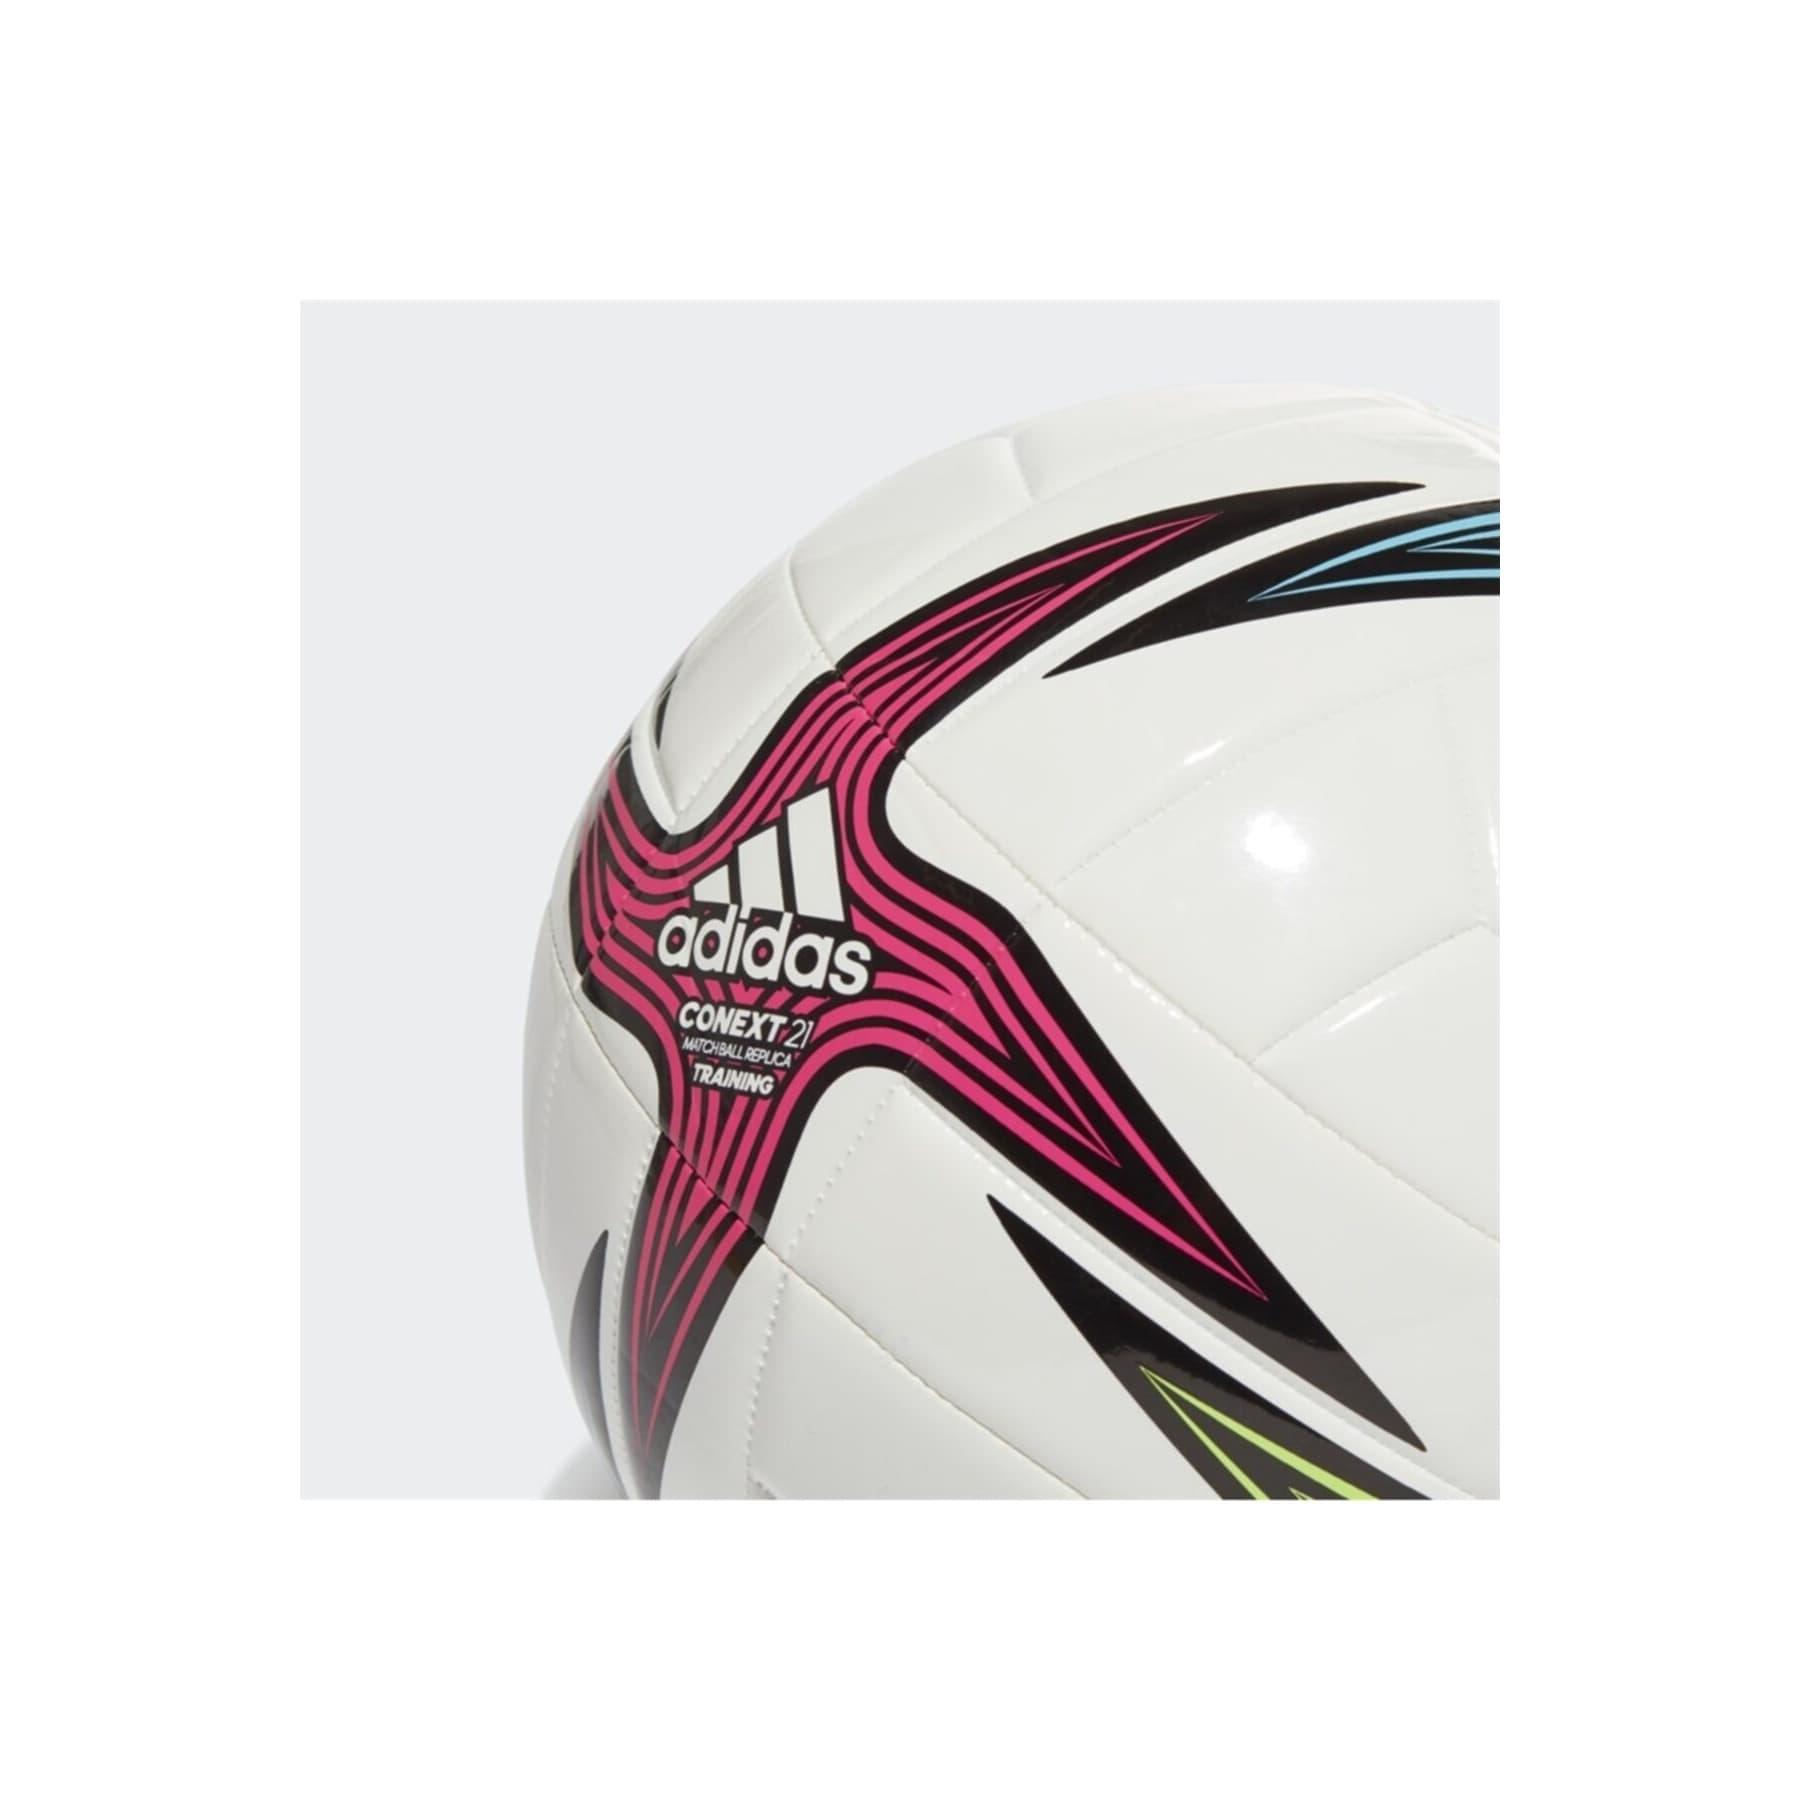 adidas Conext 21 Antrenman Futbol Topu (GK3491)